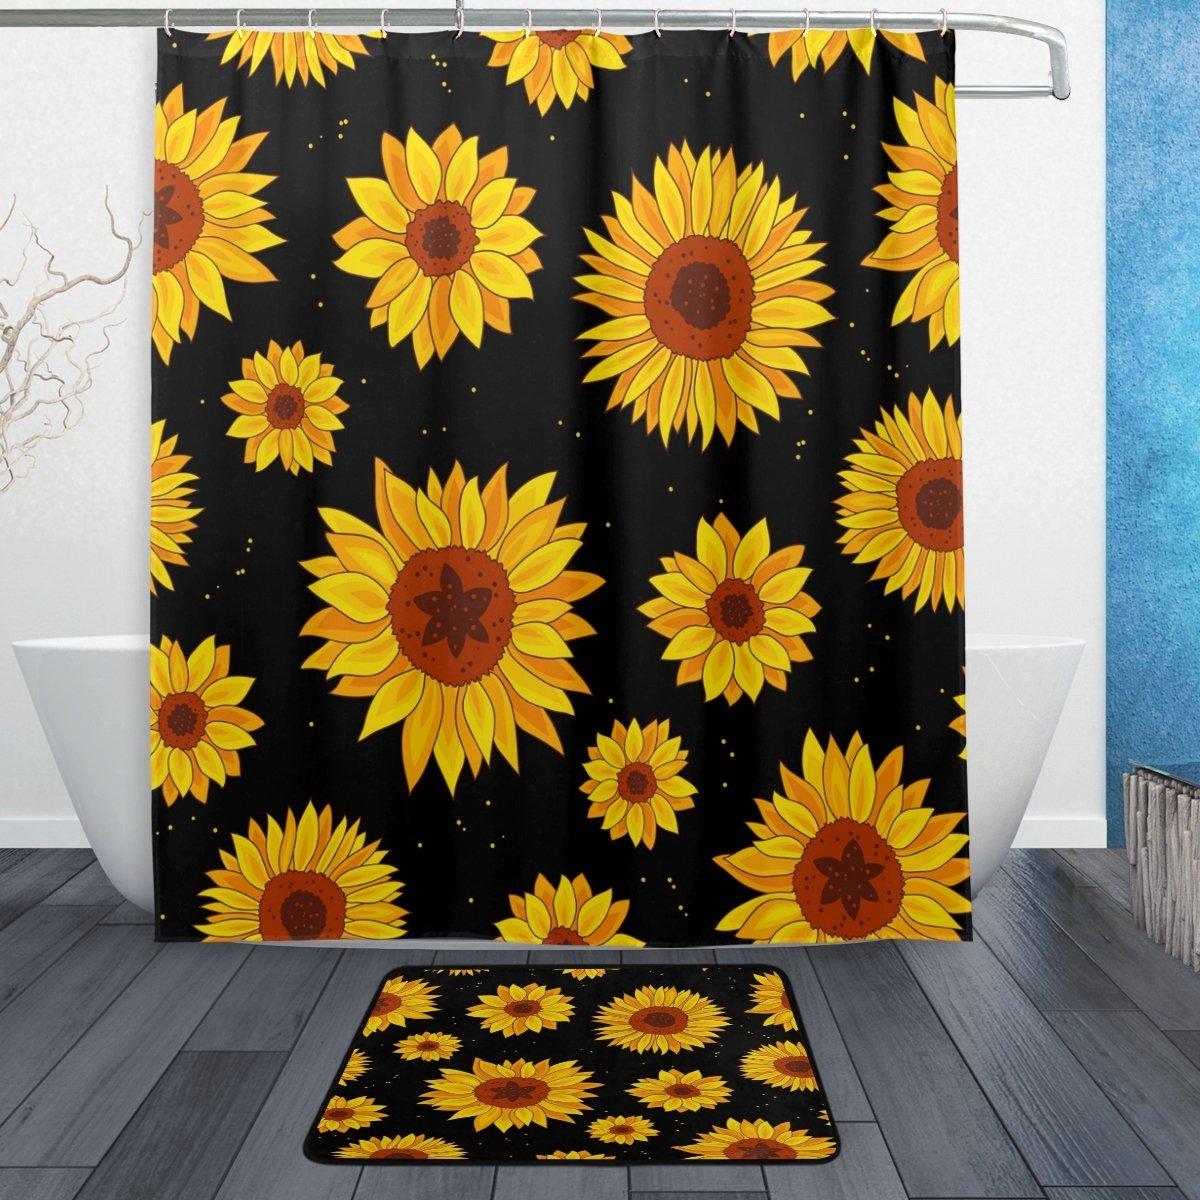 Watercolor Sunflower Flower Waterproof Polyester Fabric Shower Curtain with Hooks Doormat Bath Floor Mat Bathroom Home Decor